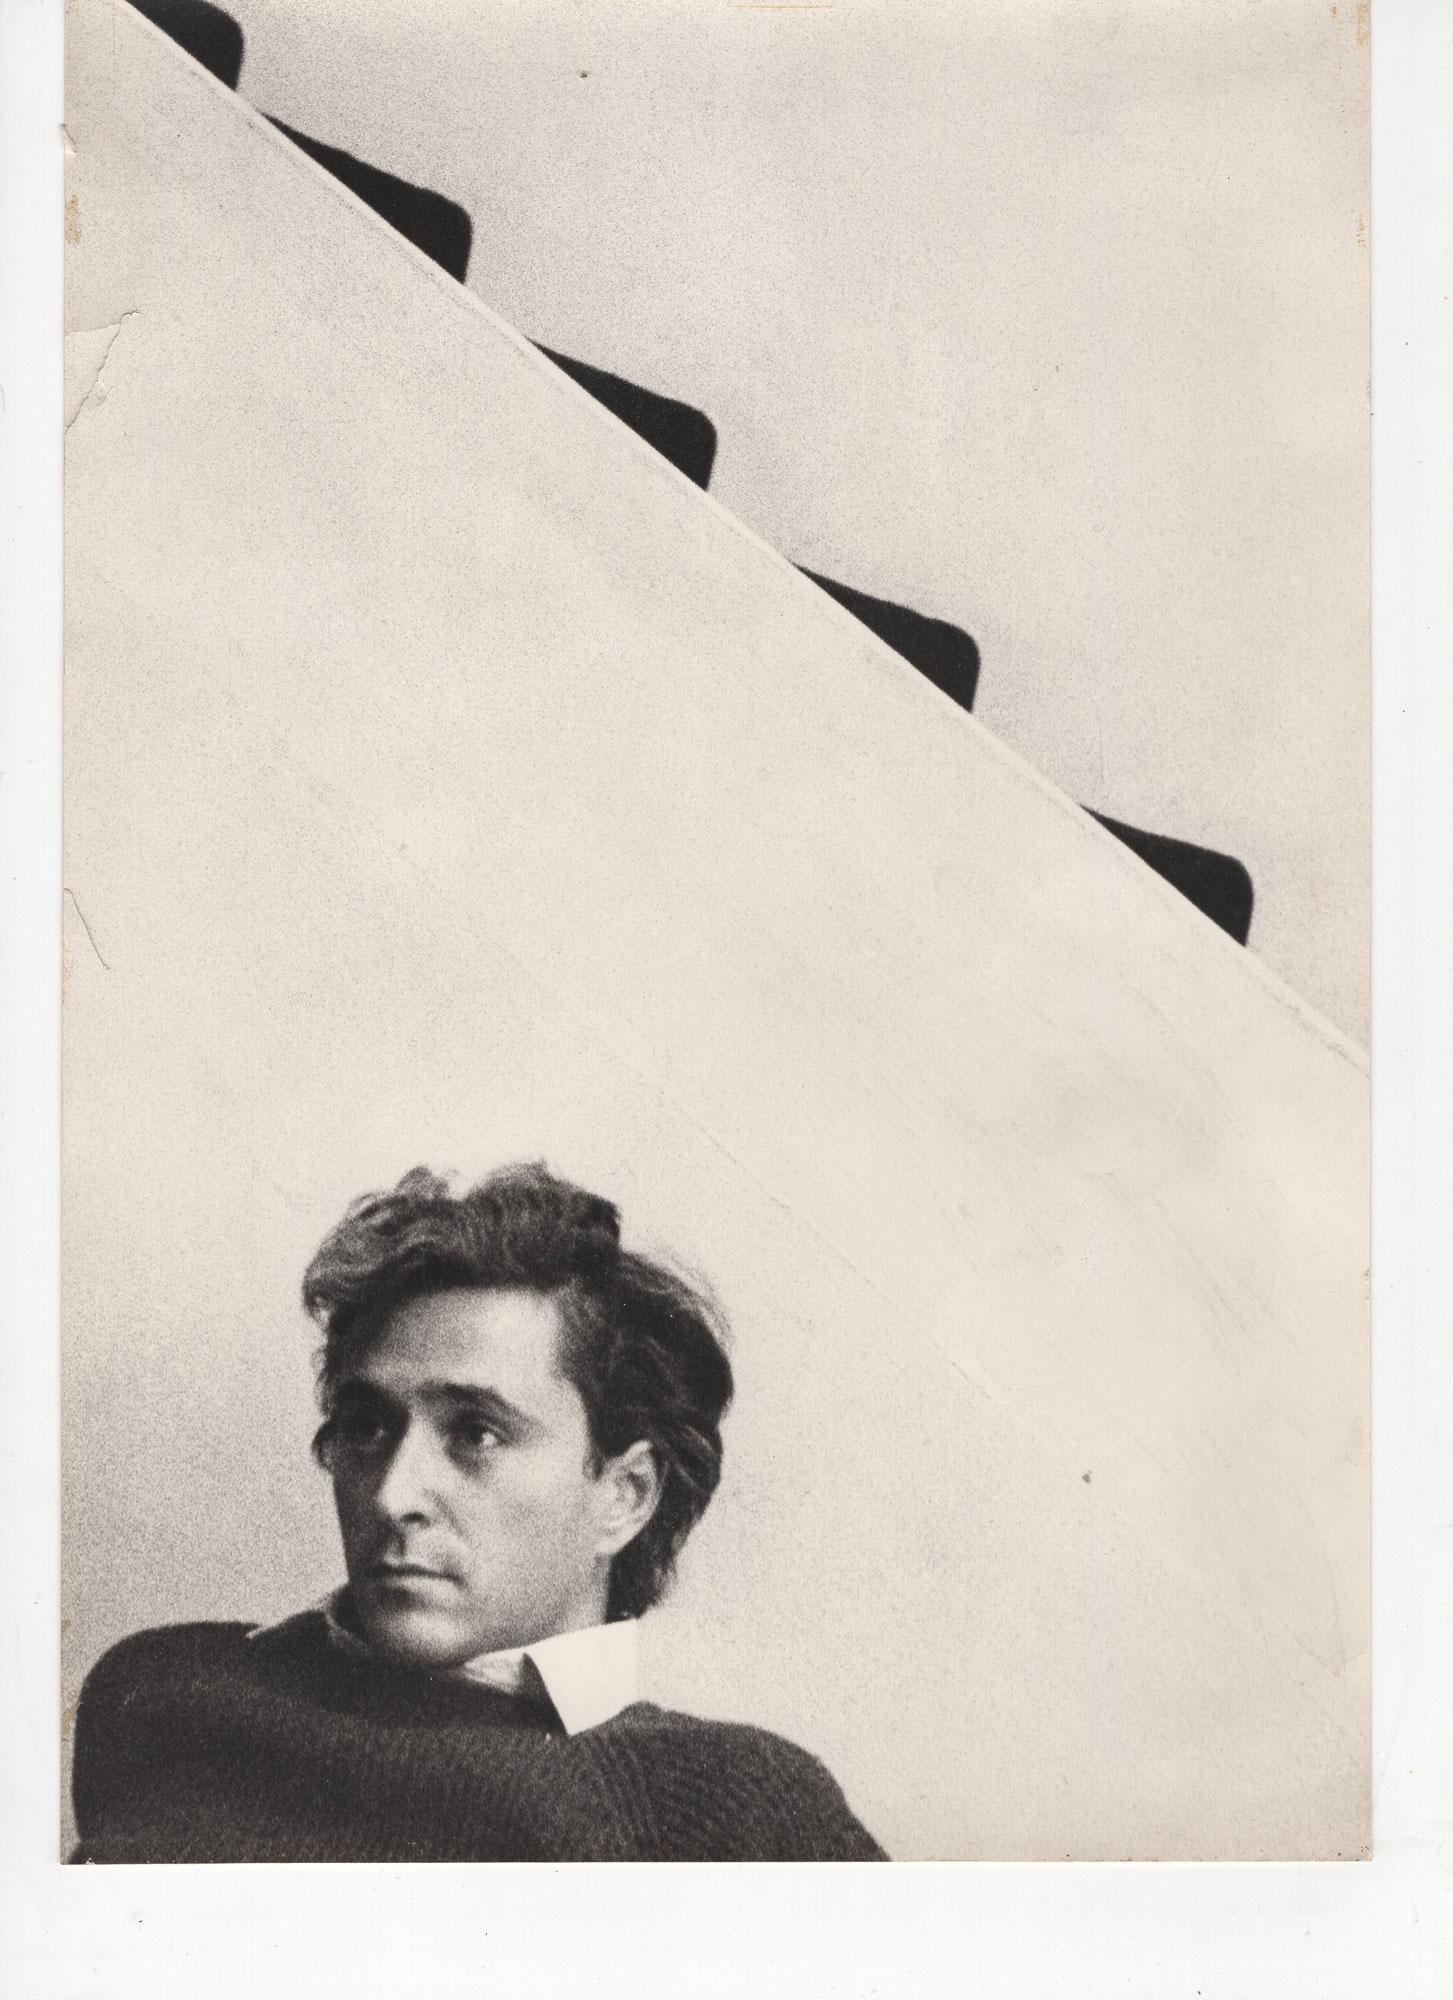 Fondazione Prada, Domenico Gnoli 1963- photo Mimi Gnoli